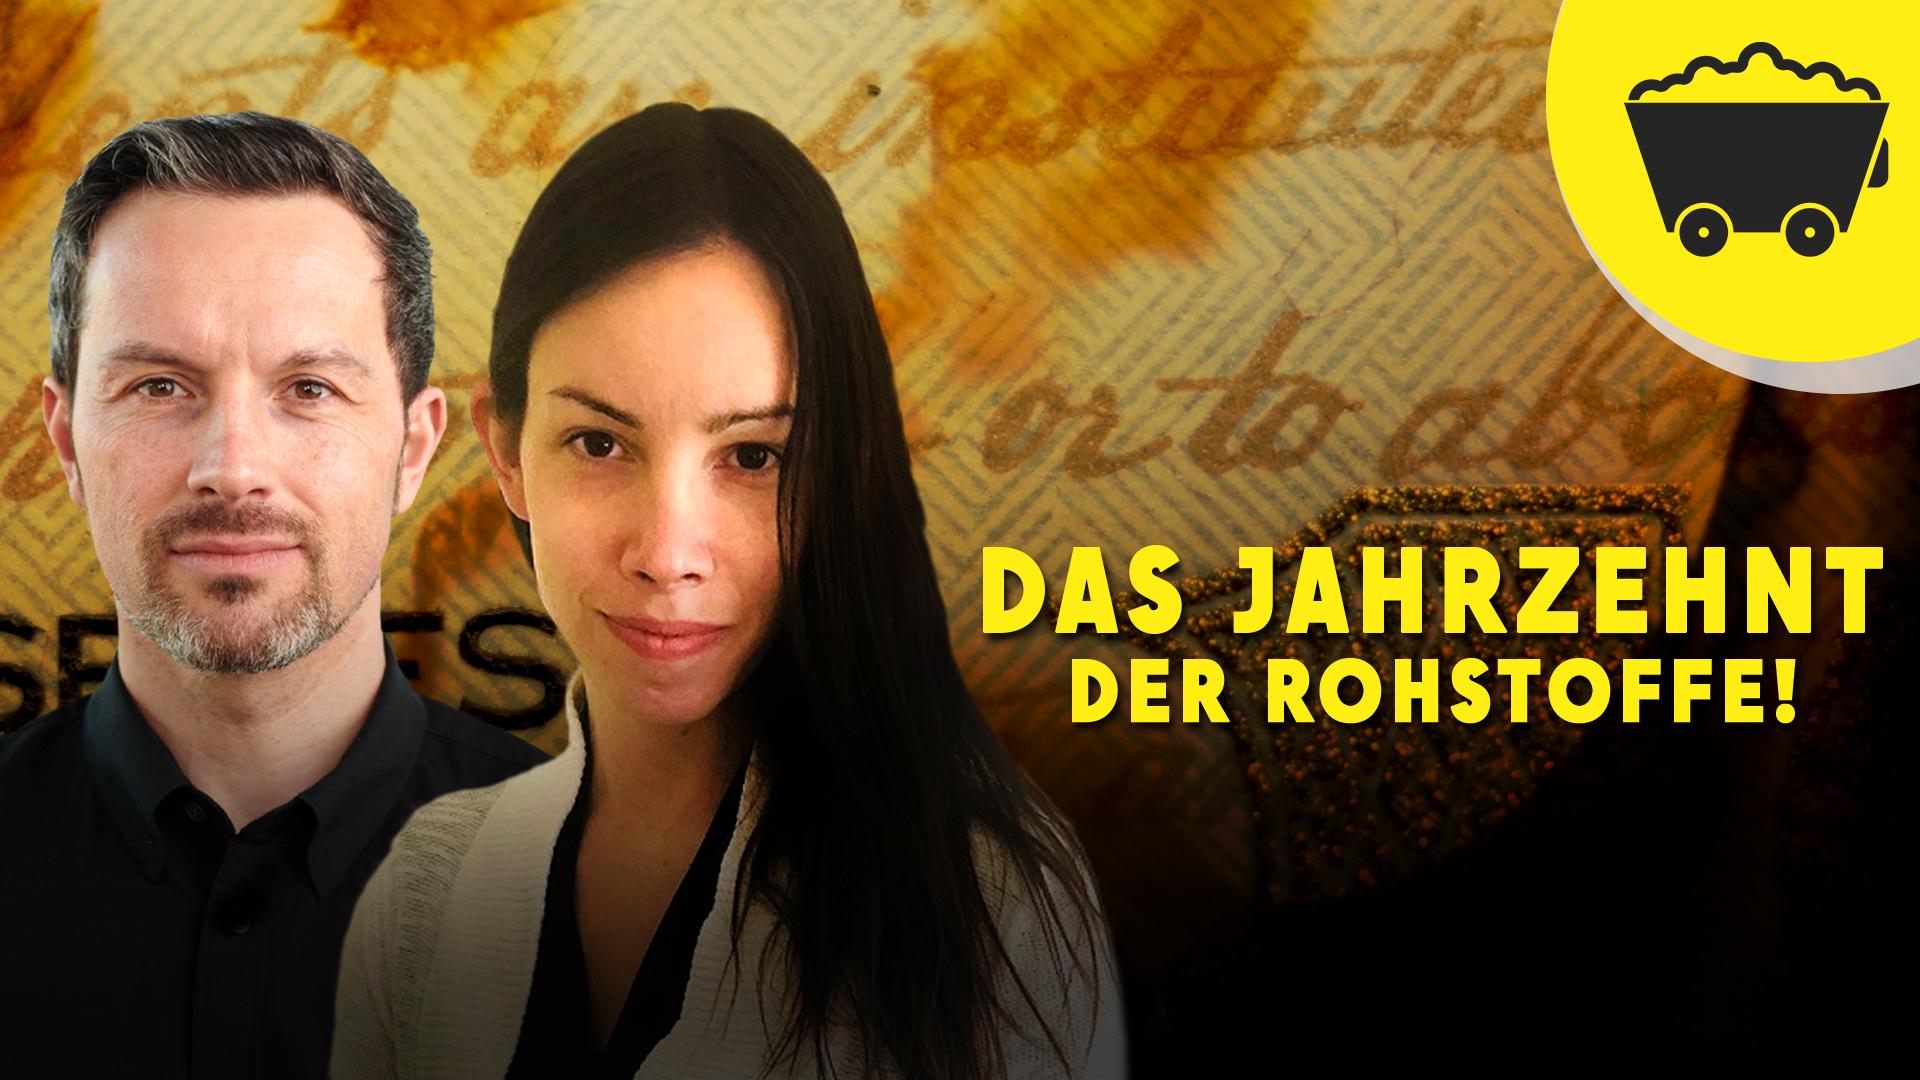 YouTube: Lyn Alden: Öl MUSS ins Depot! - Vorsicht vor Währungen